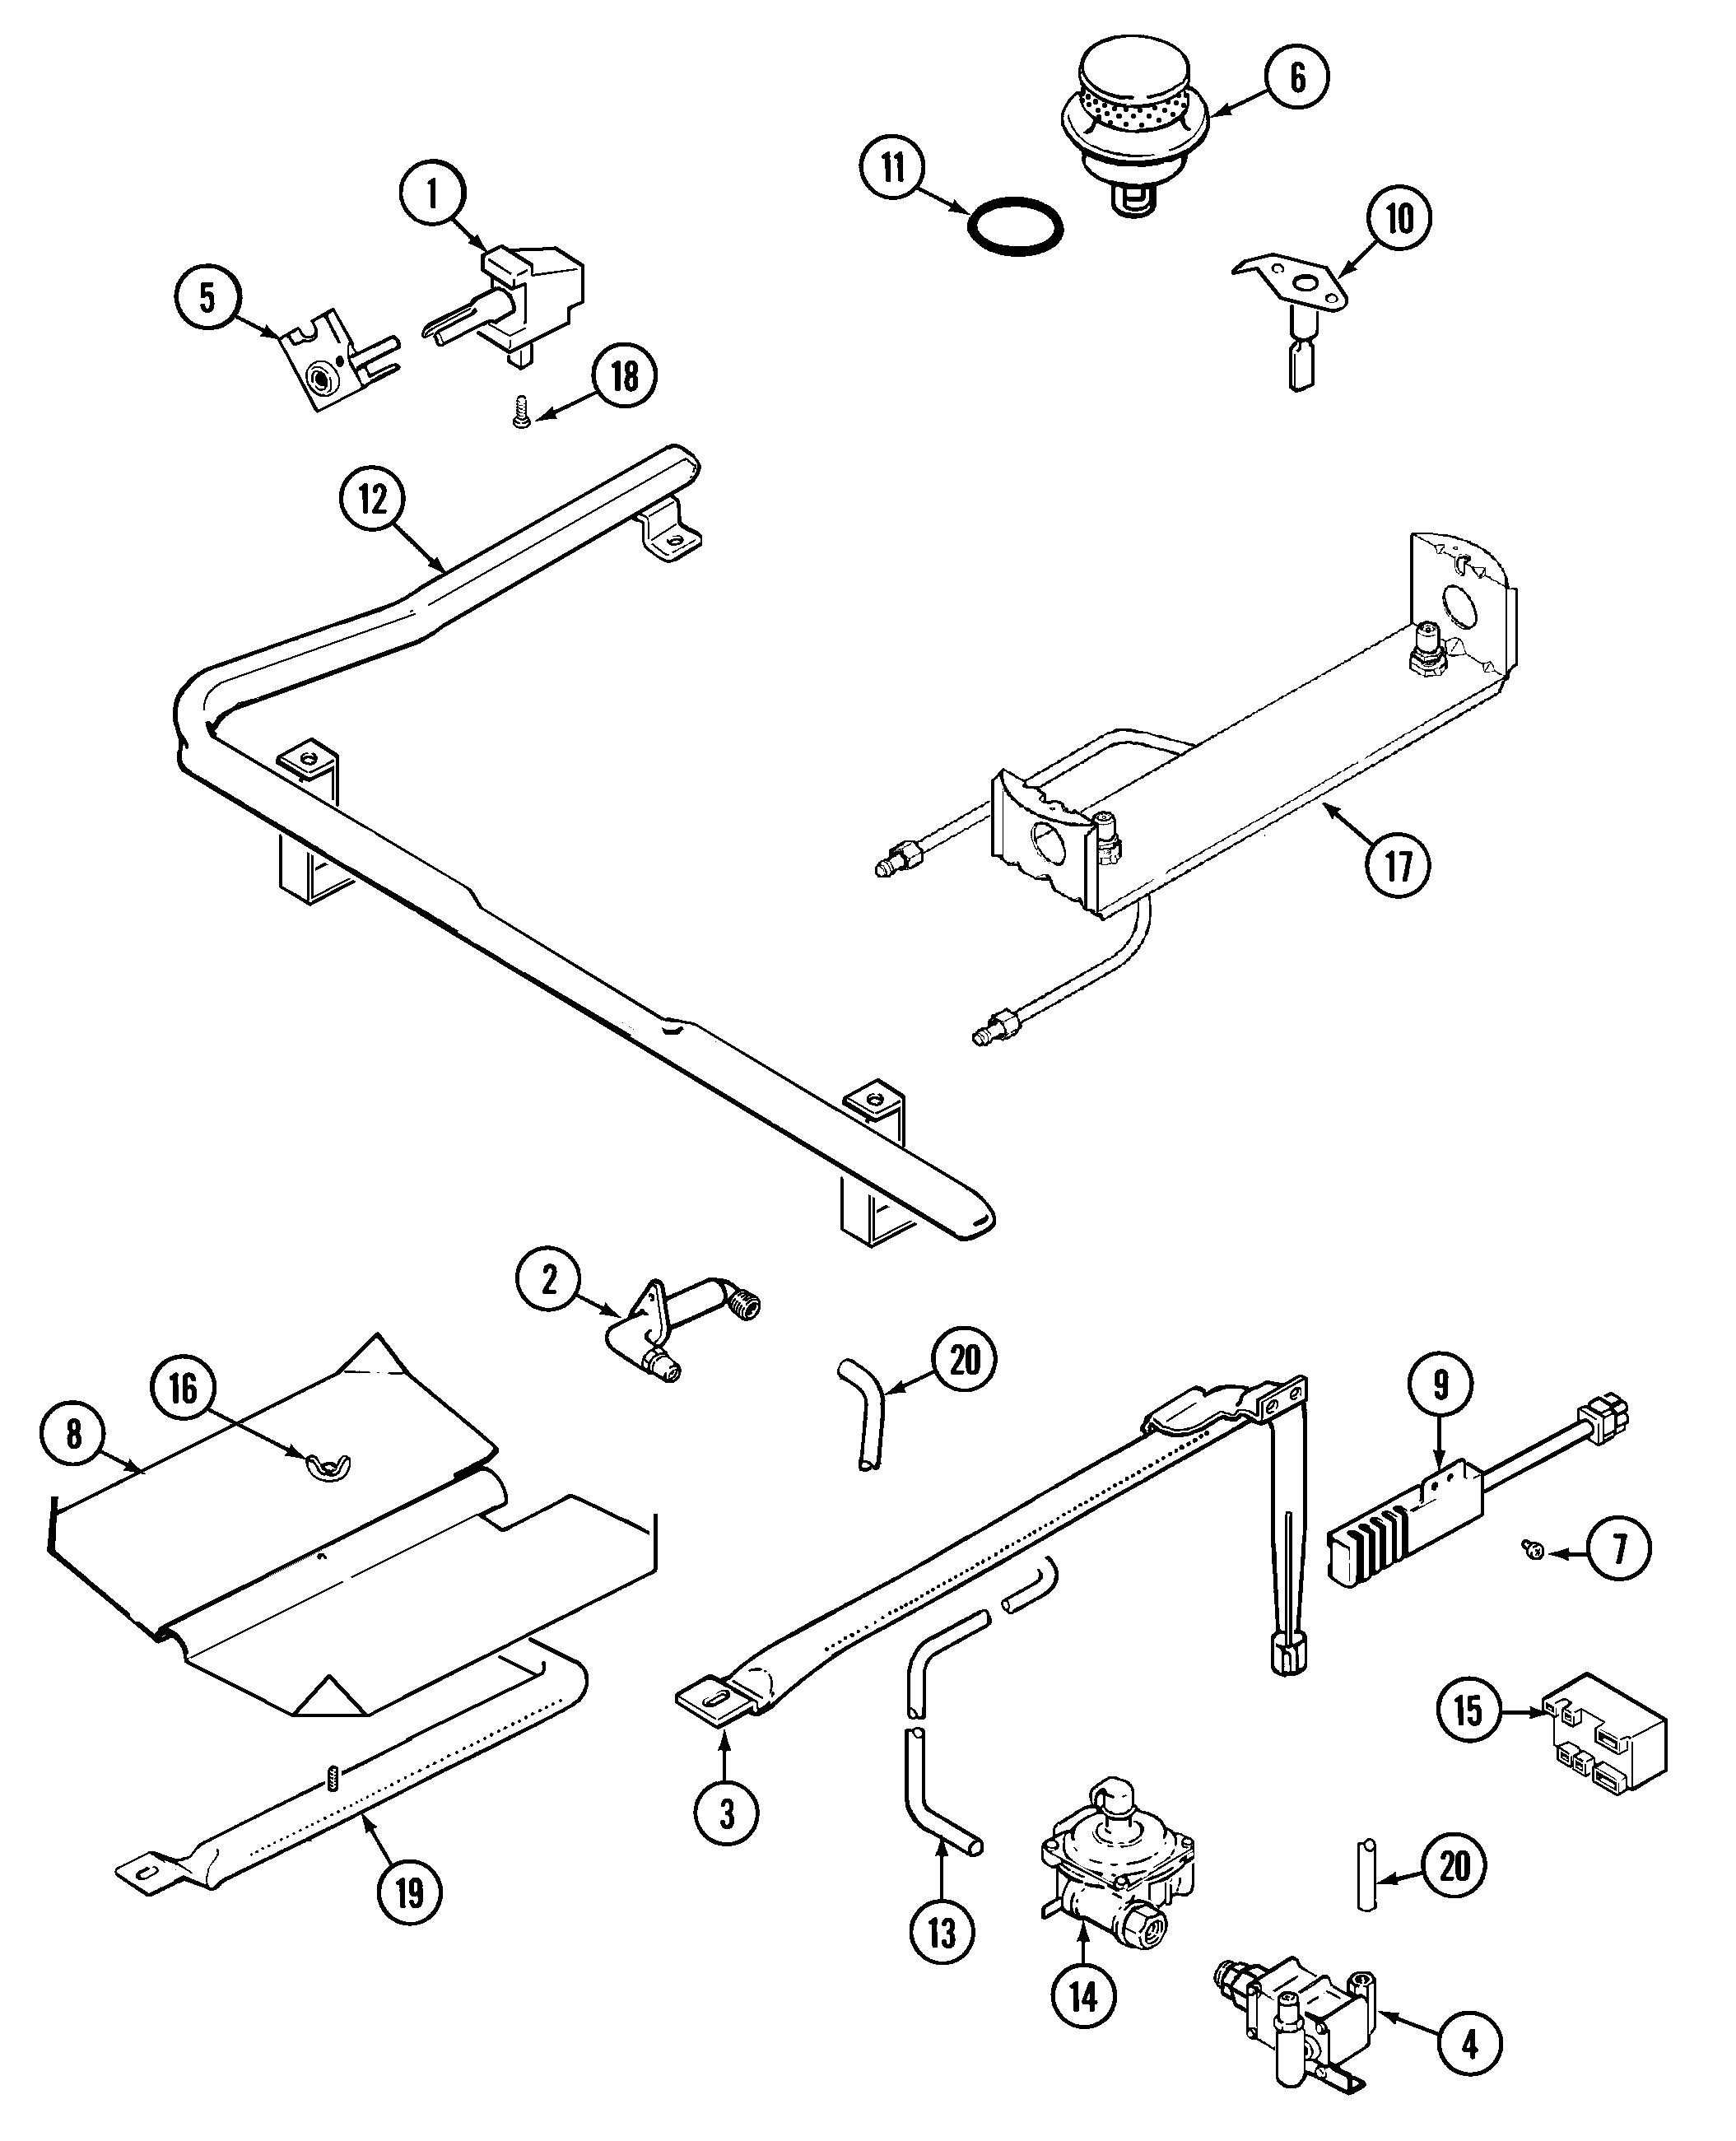 Maytag Dryer Wiring Diagram On Performa Dryer Timer Wiring Diagram